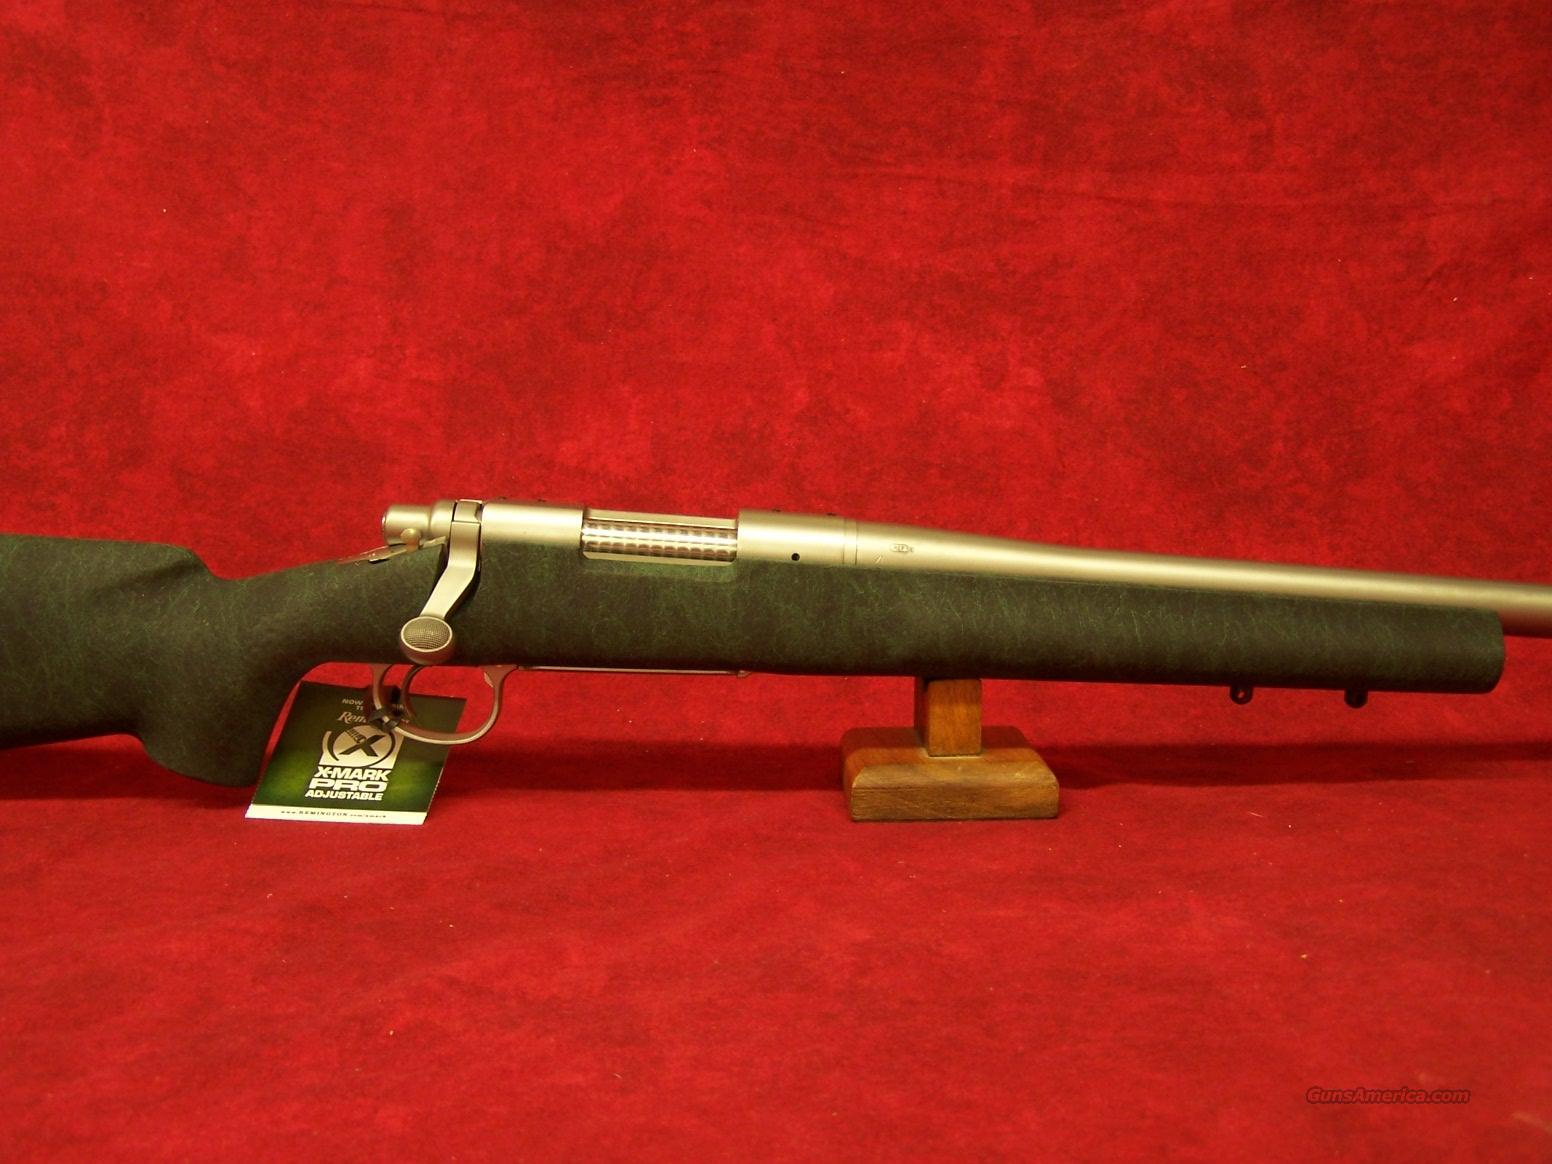 "Remington 700 Stainless 20"" Threaded barrel Special 5-R Milspec .308 cal(85200)  Guns > Rifles > Remington Rifles - Modern > Model 700 > Sporting"